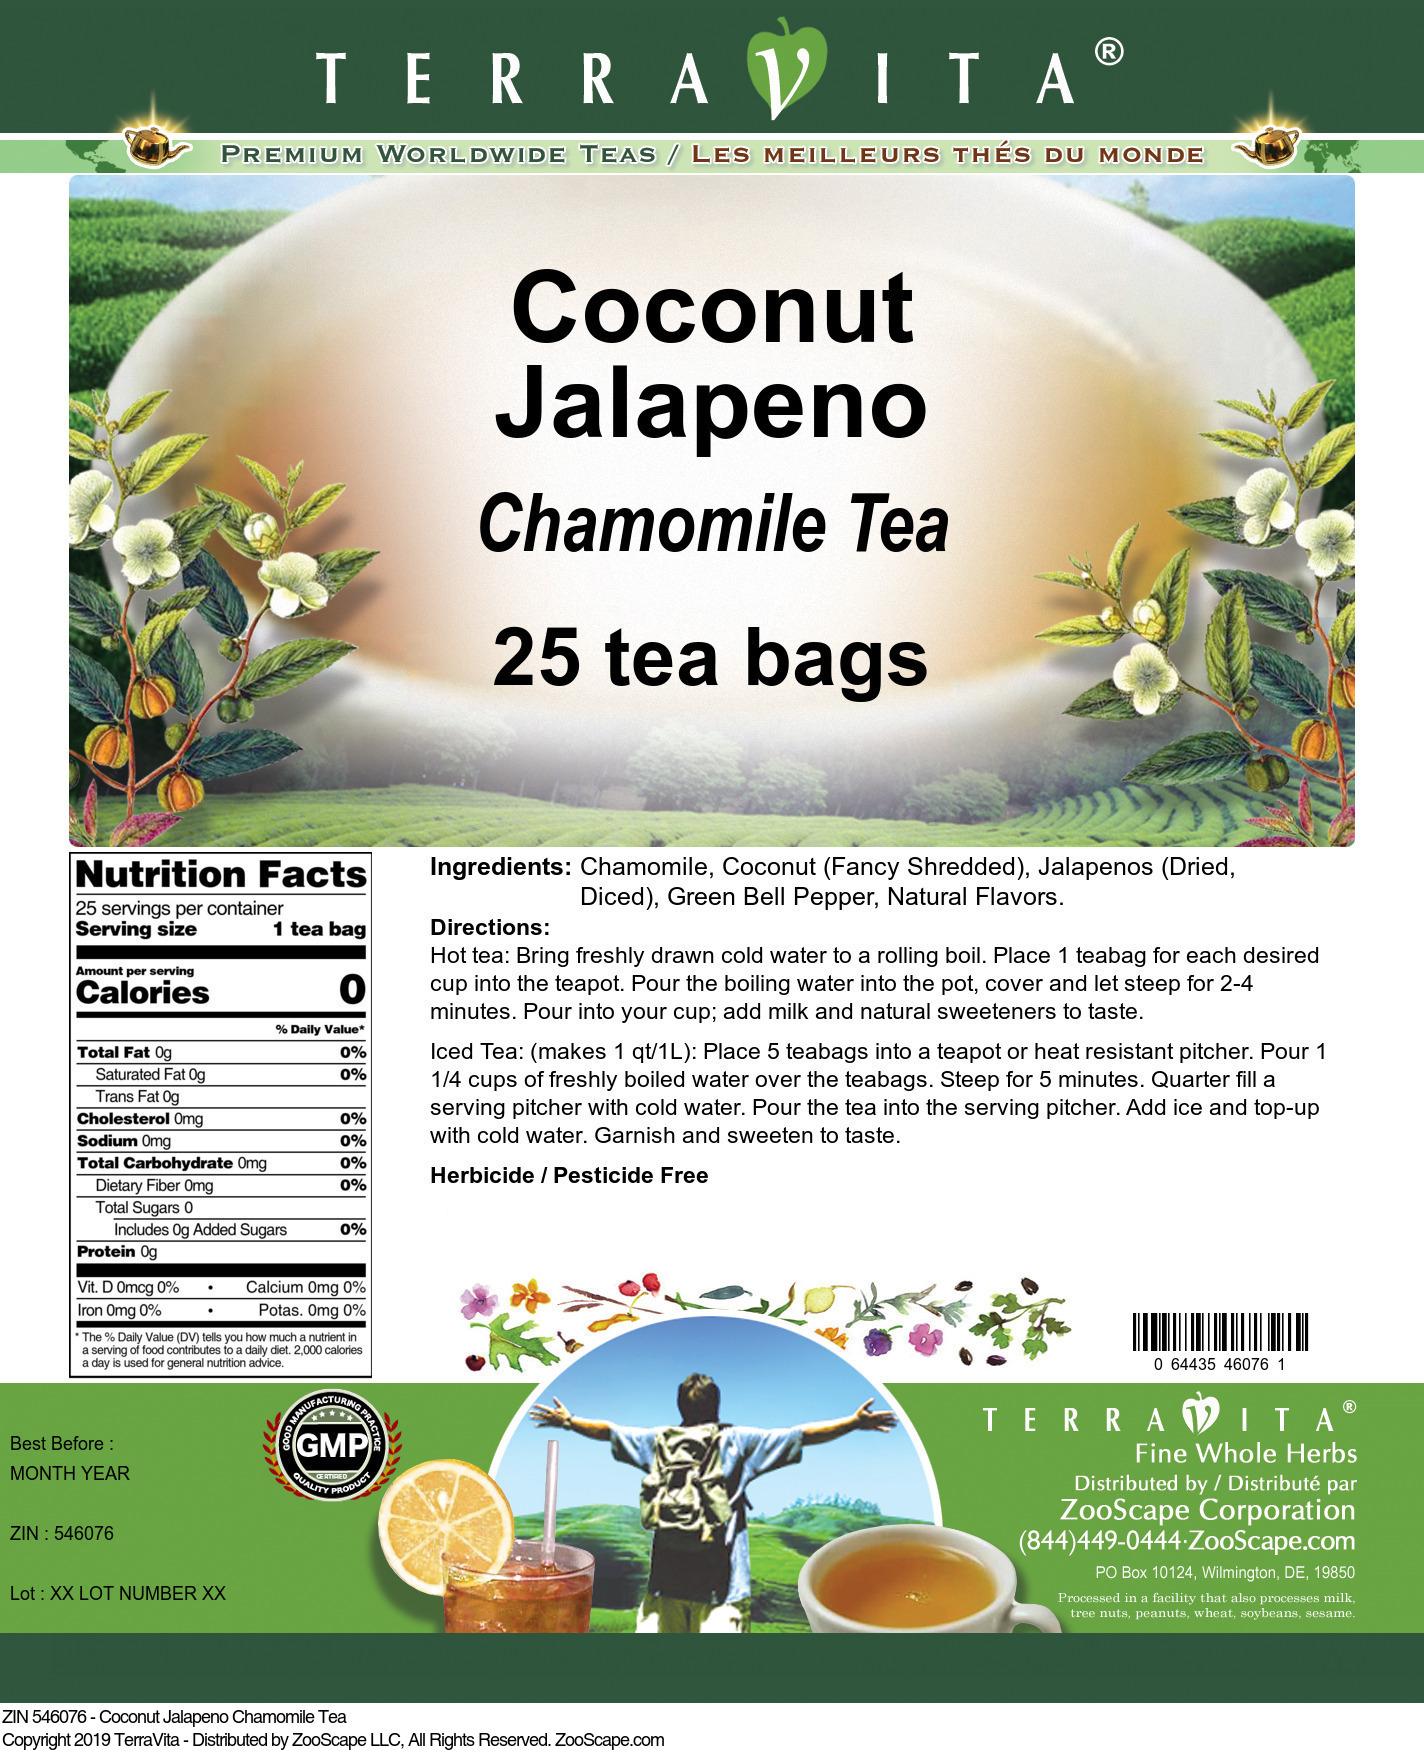 Coconut Jalapeno Chamomile Tea